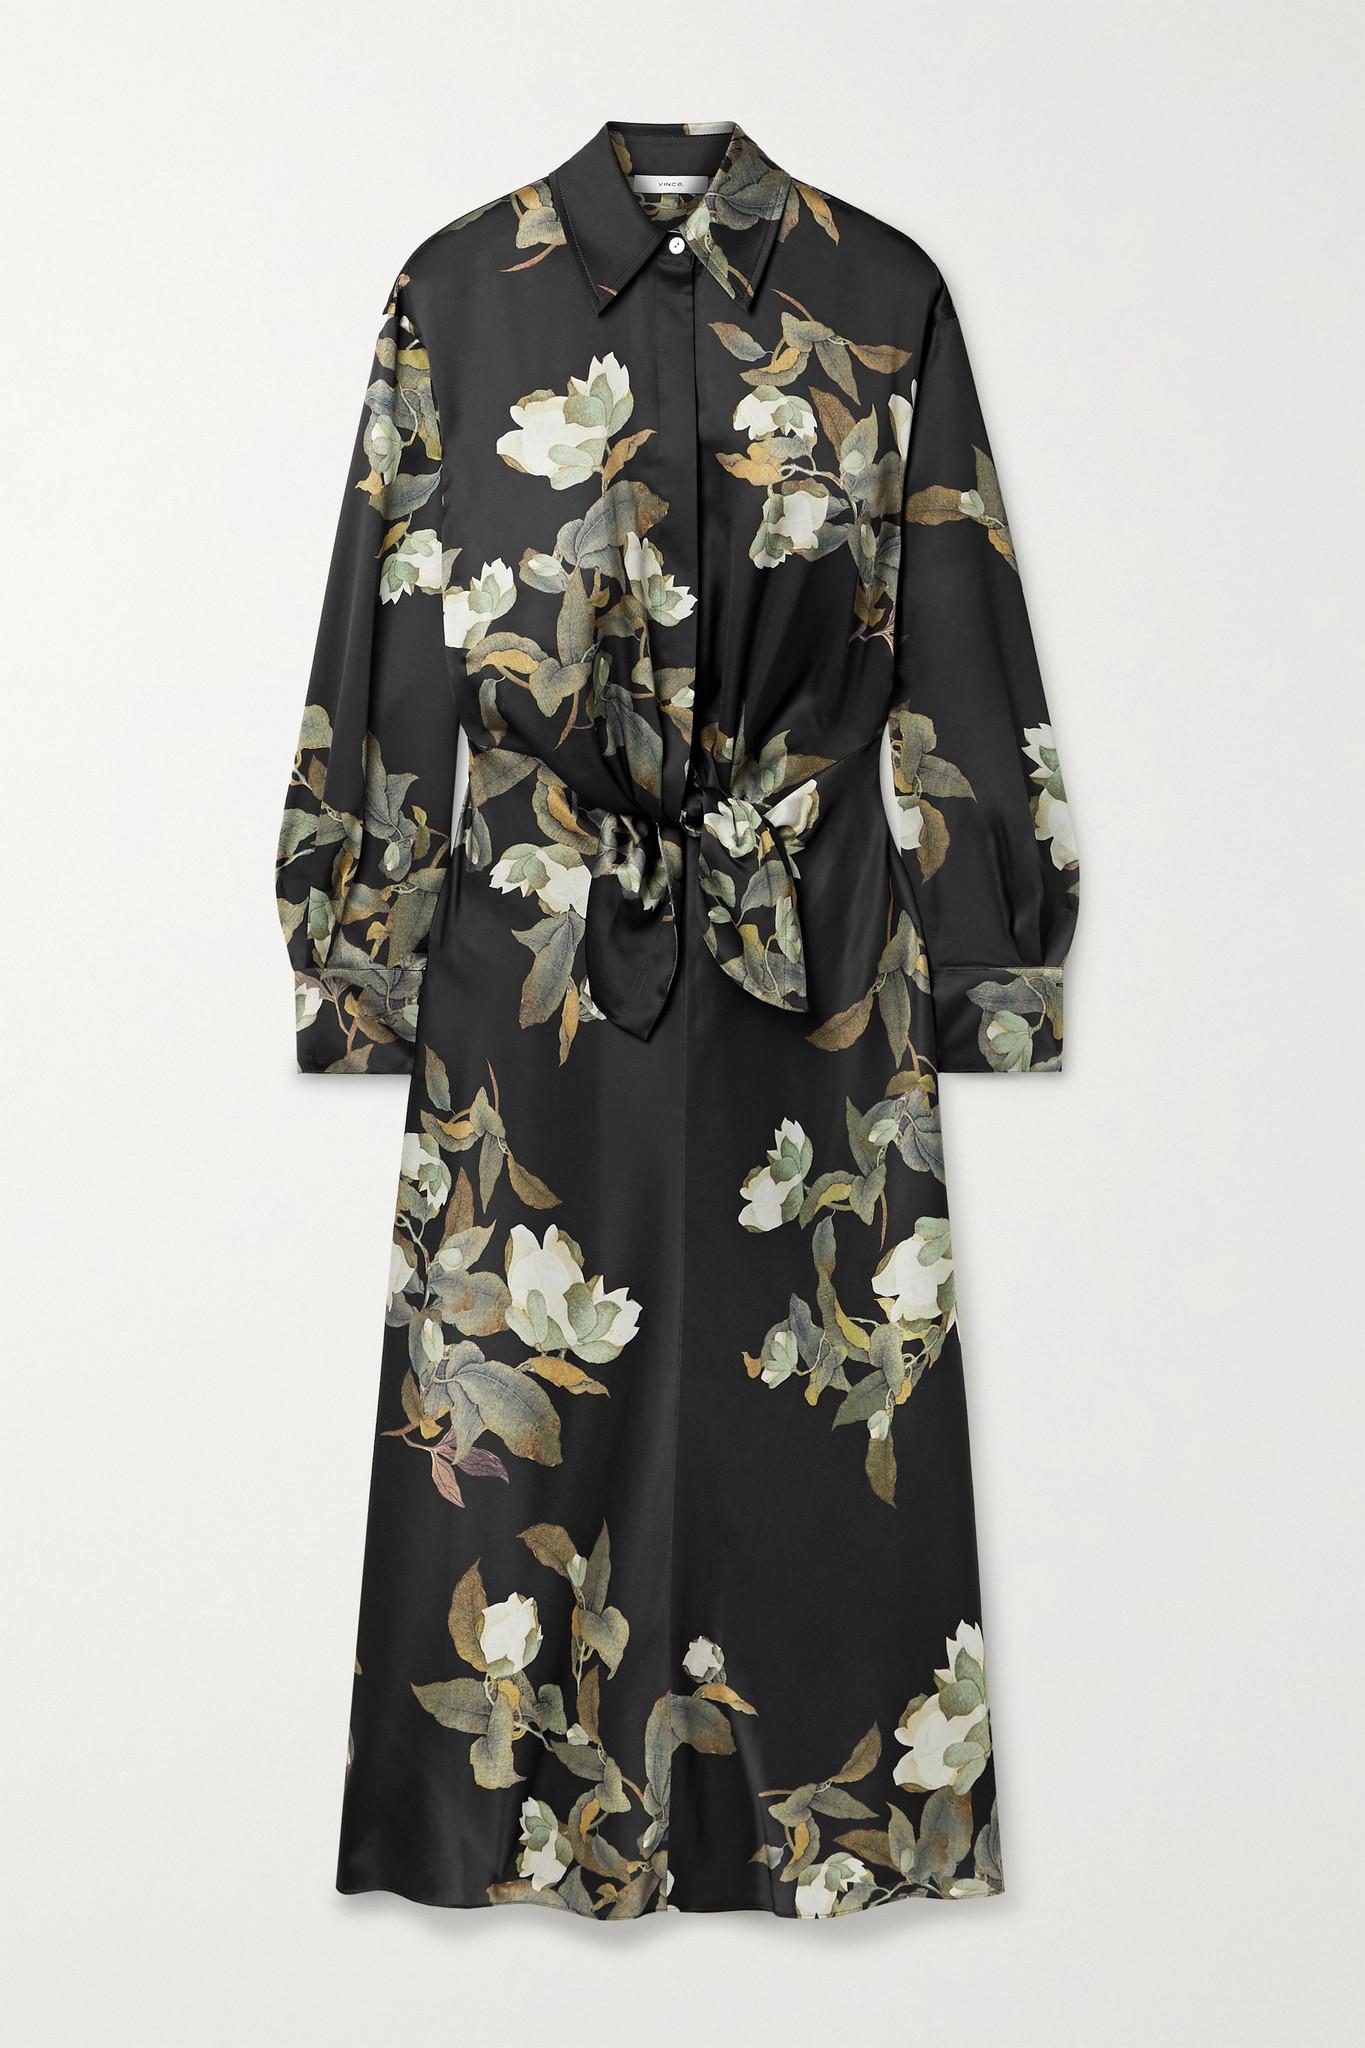 VINCE - Lisianthus 正面系带花卉印花缎布衬衫式中长连衣裙 - 黑色 - x small